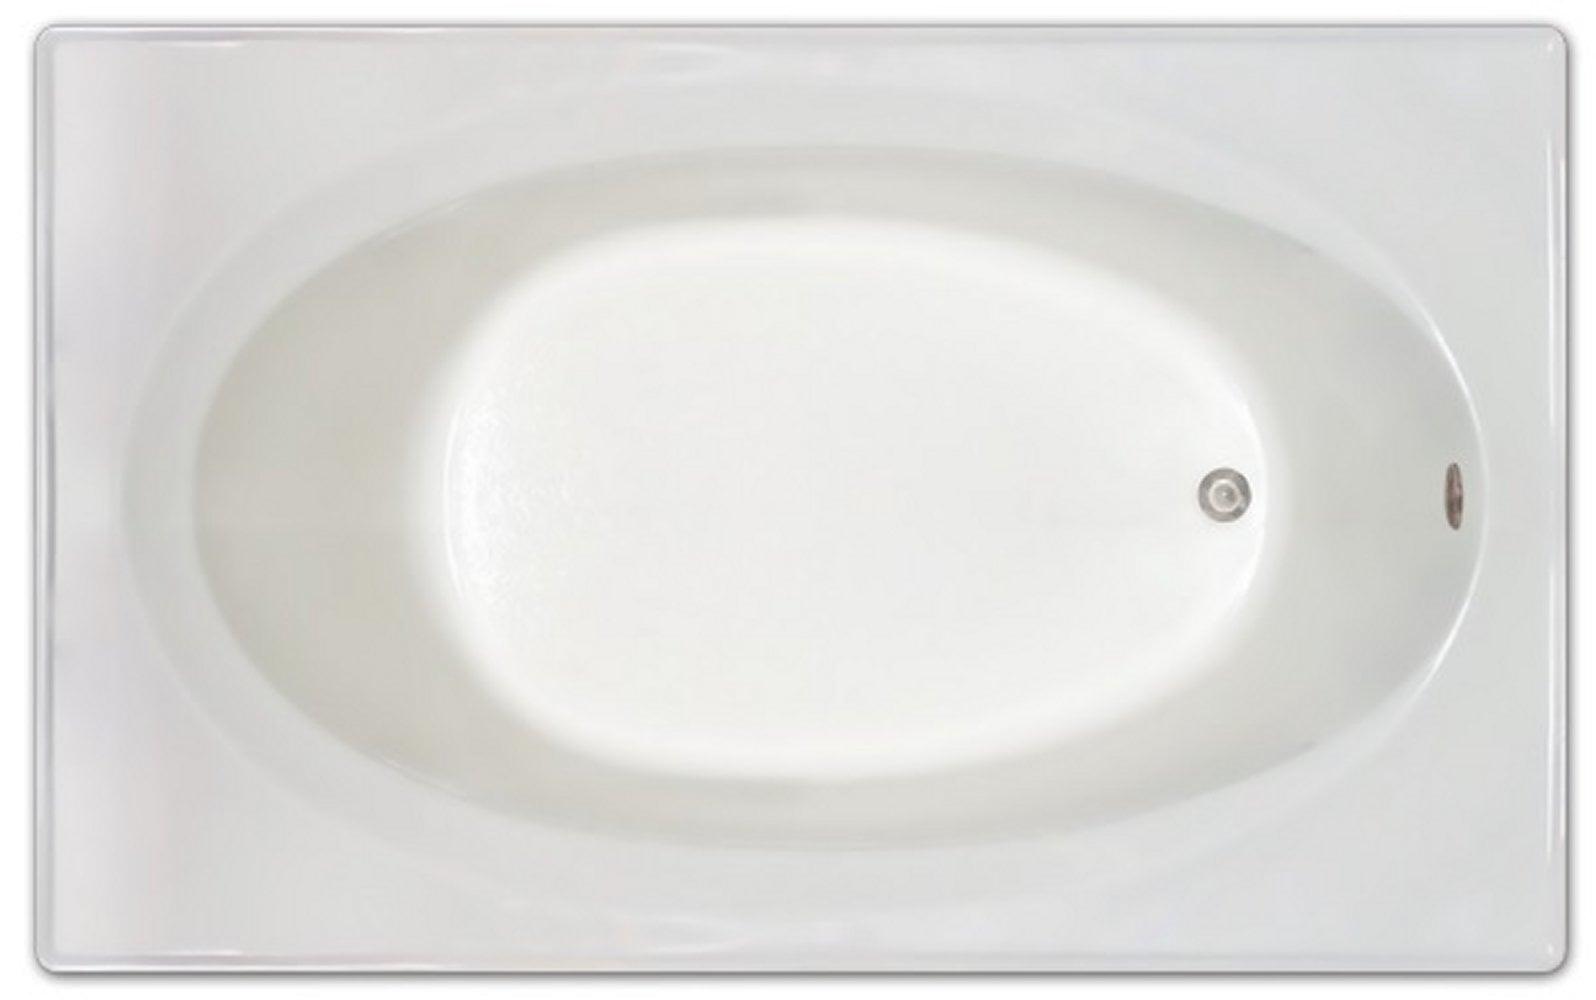 Drop-in Bathtub / 72x42x19 / high gloss white acrylic / Rectangle / LPI225-S Pinnacle Bath - Soaker 0